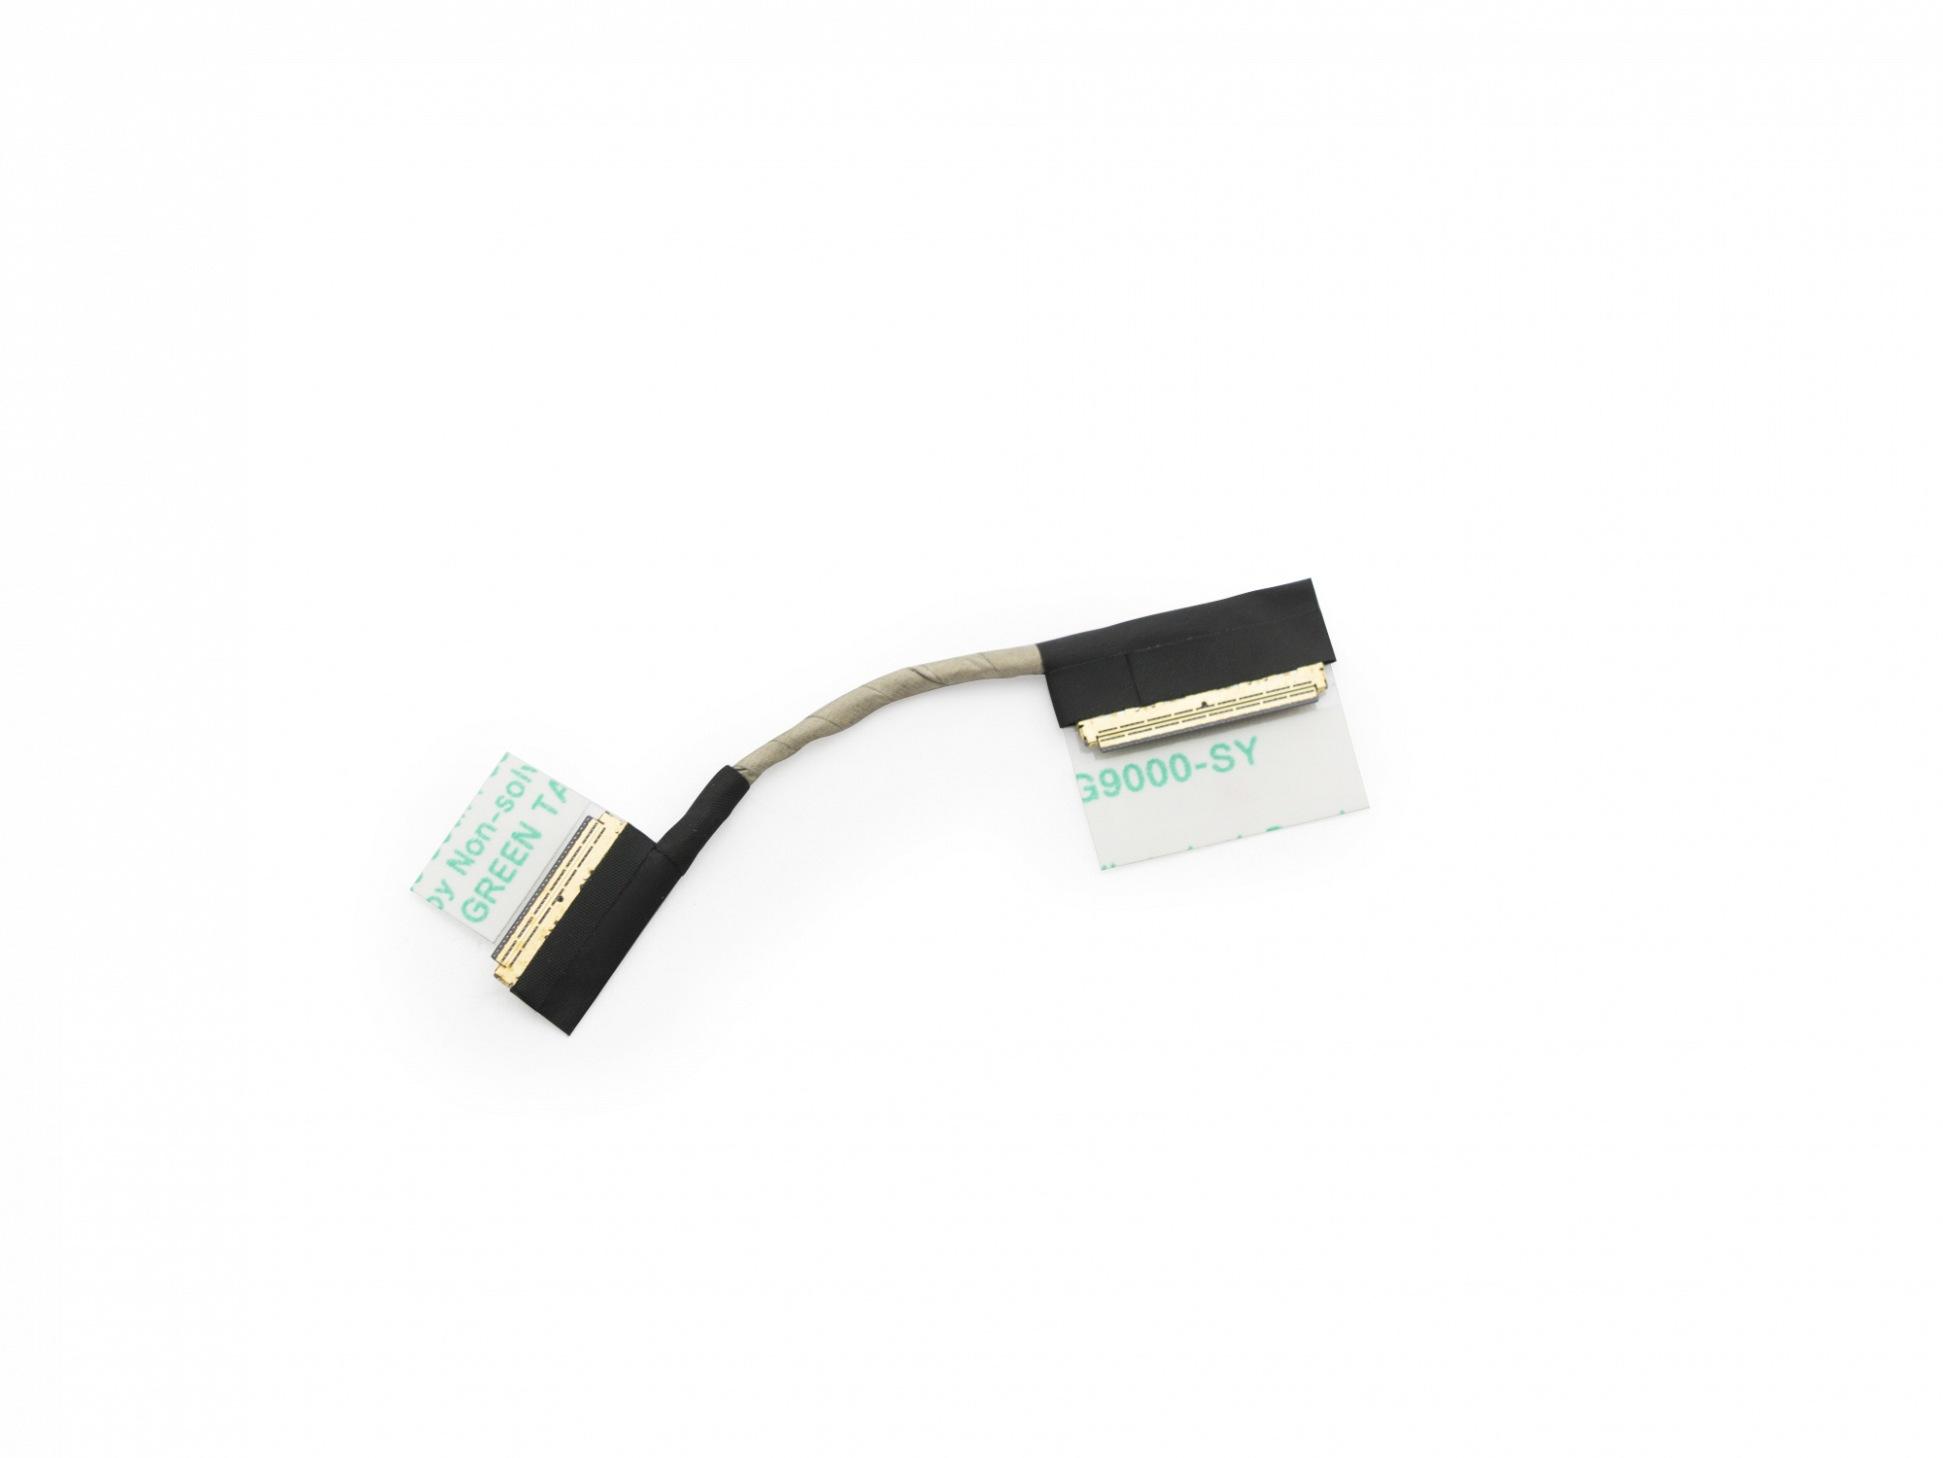 Displaykabel LVDS 40-Pin Original für Acer Iconia A3-A10 Serie